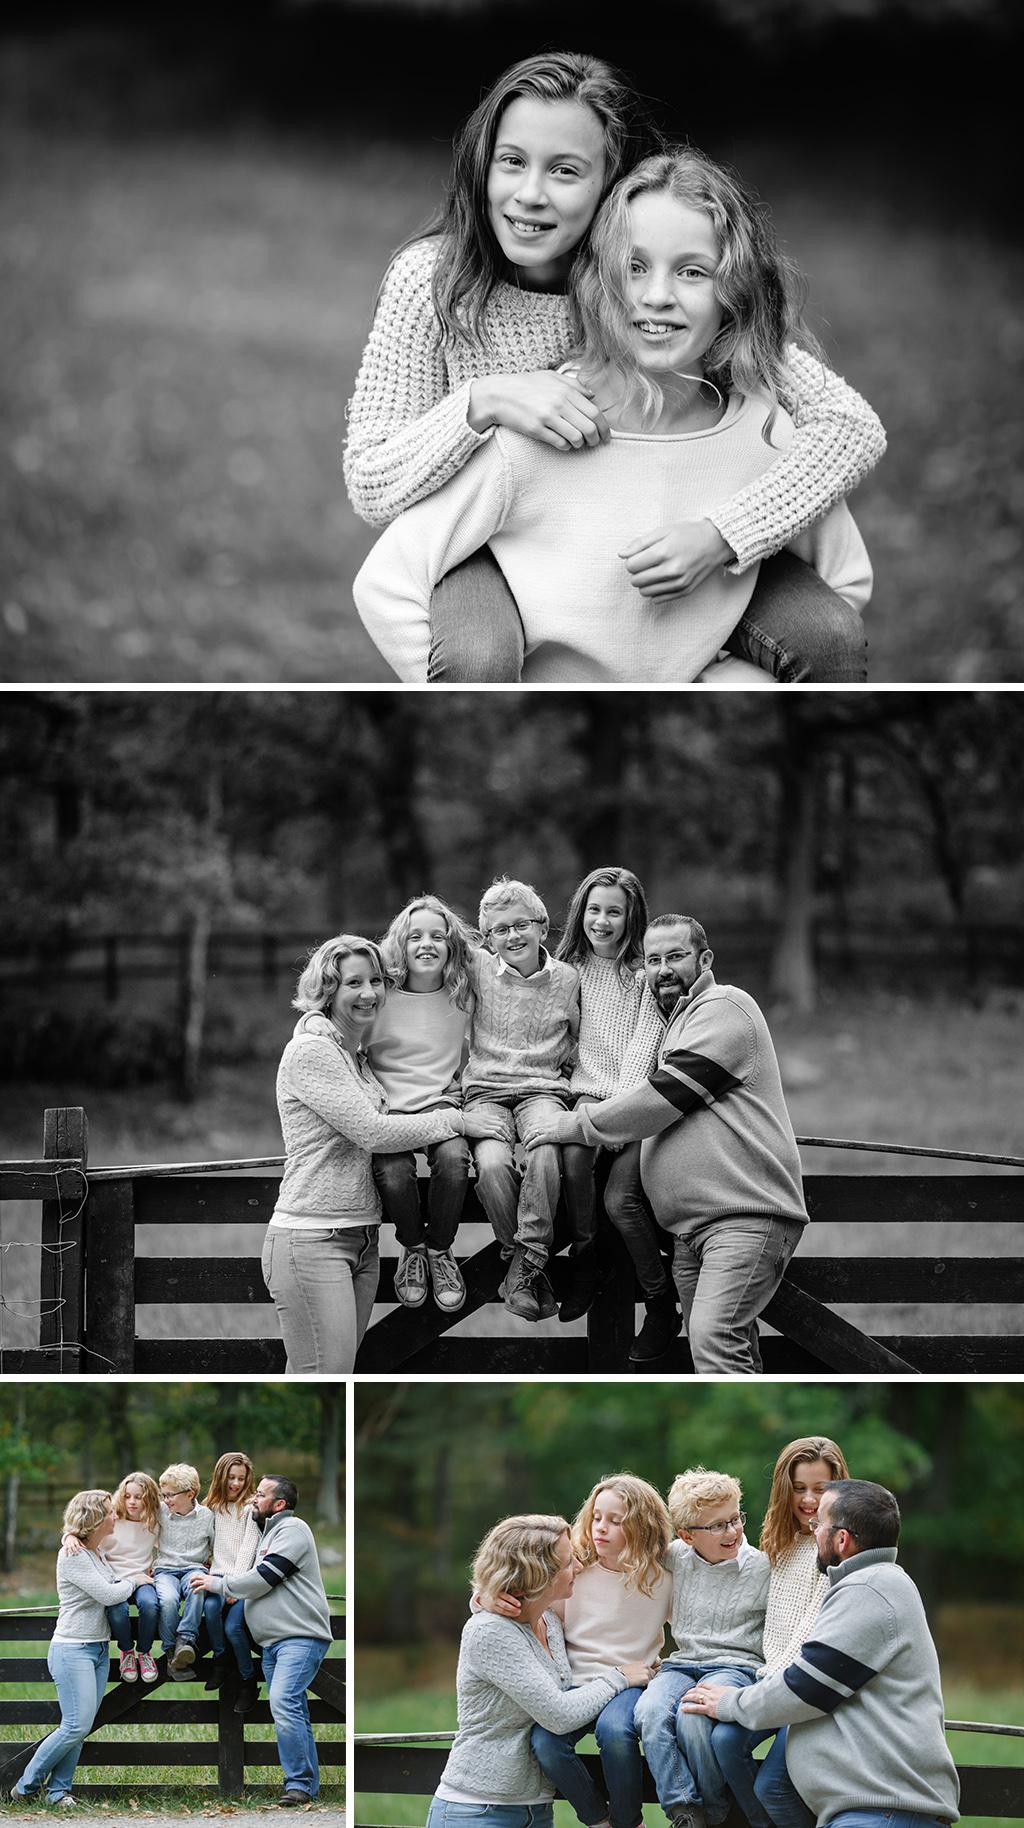 Familjefotografering_i-Stockholm_Lifestyle-familjefotograf-Anna-Sandstrom_16.jpg